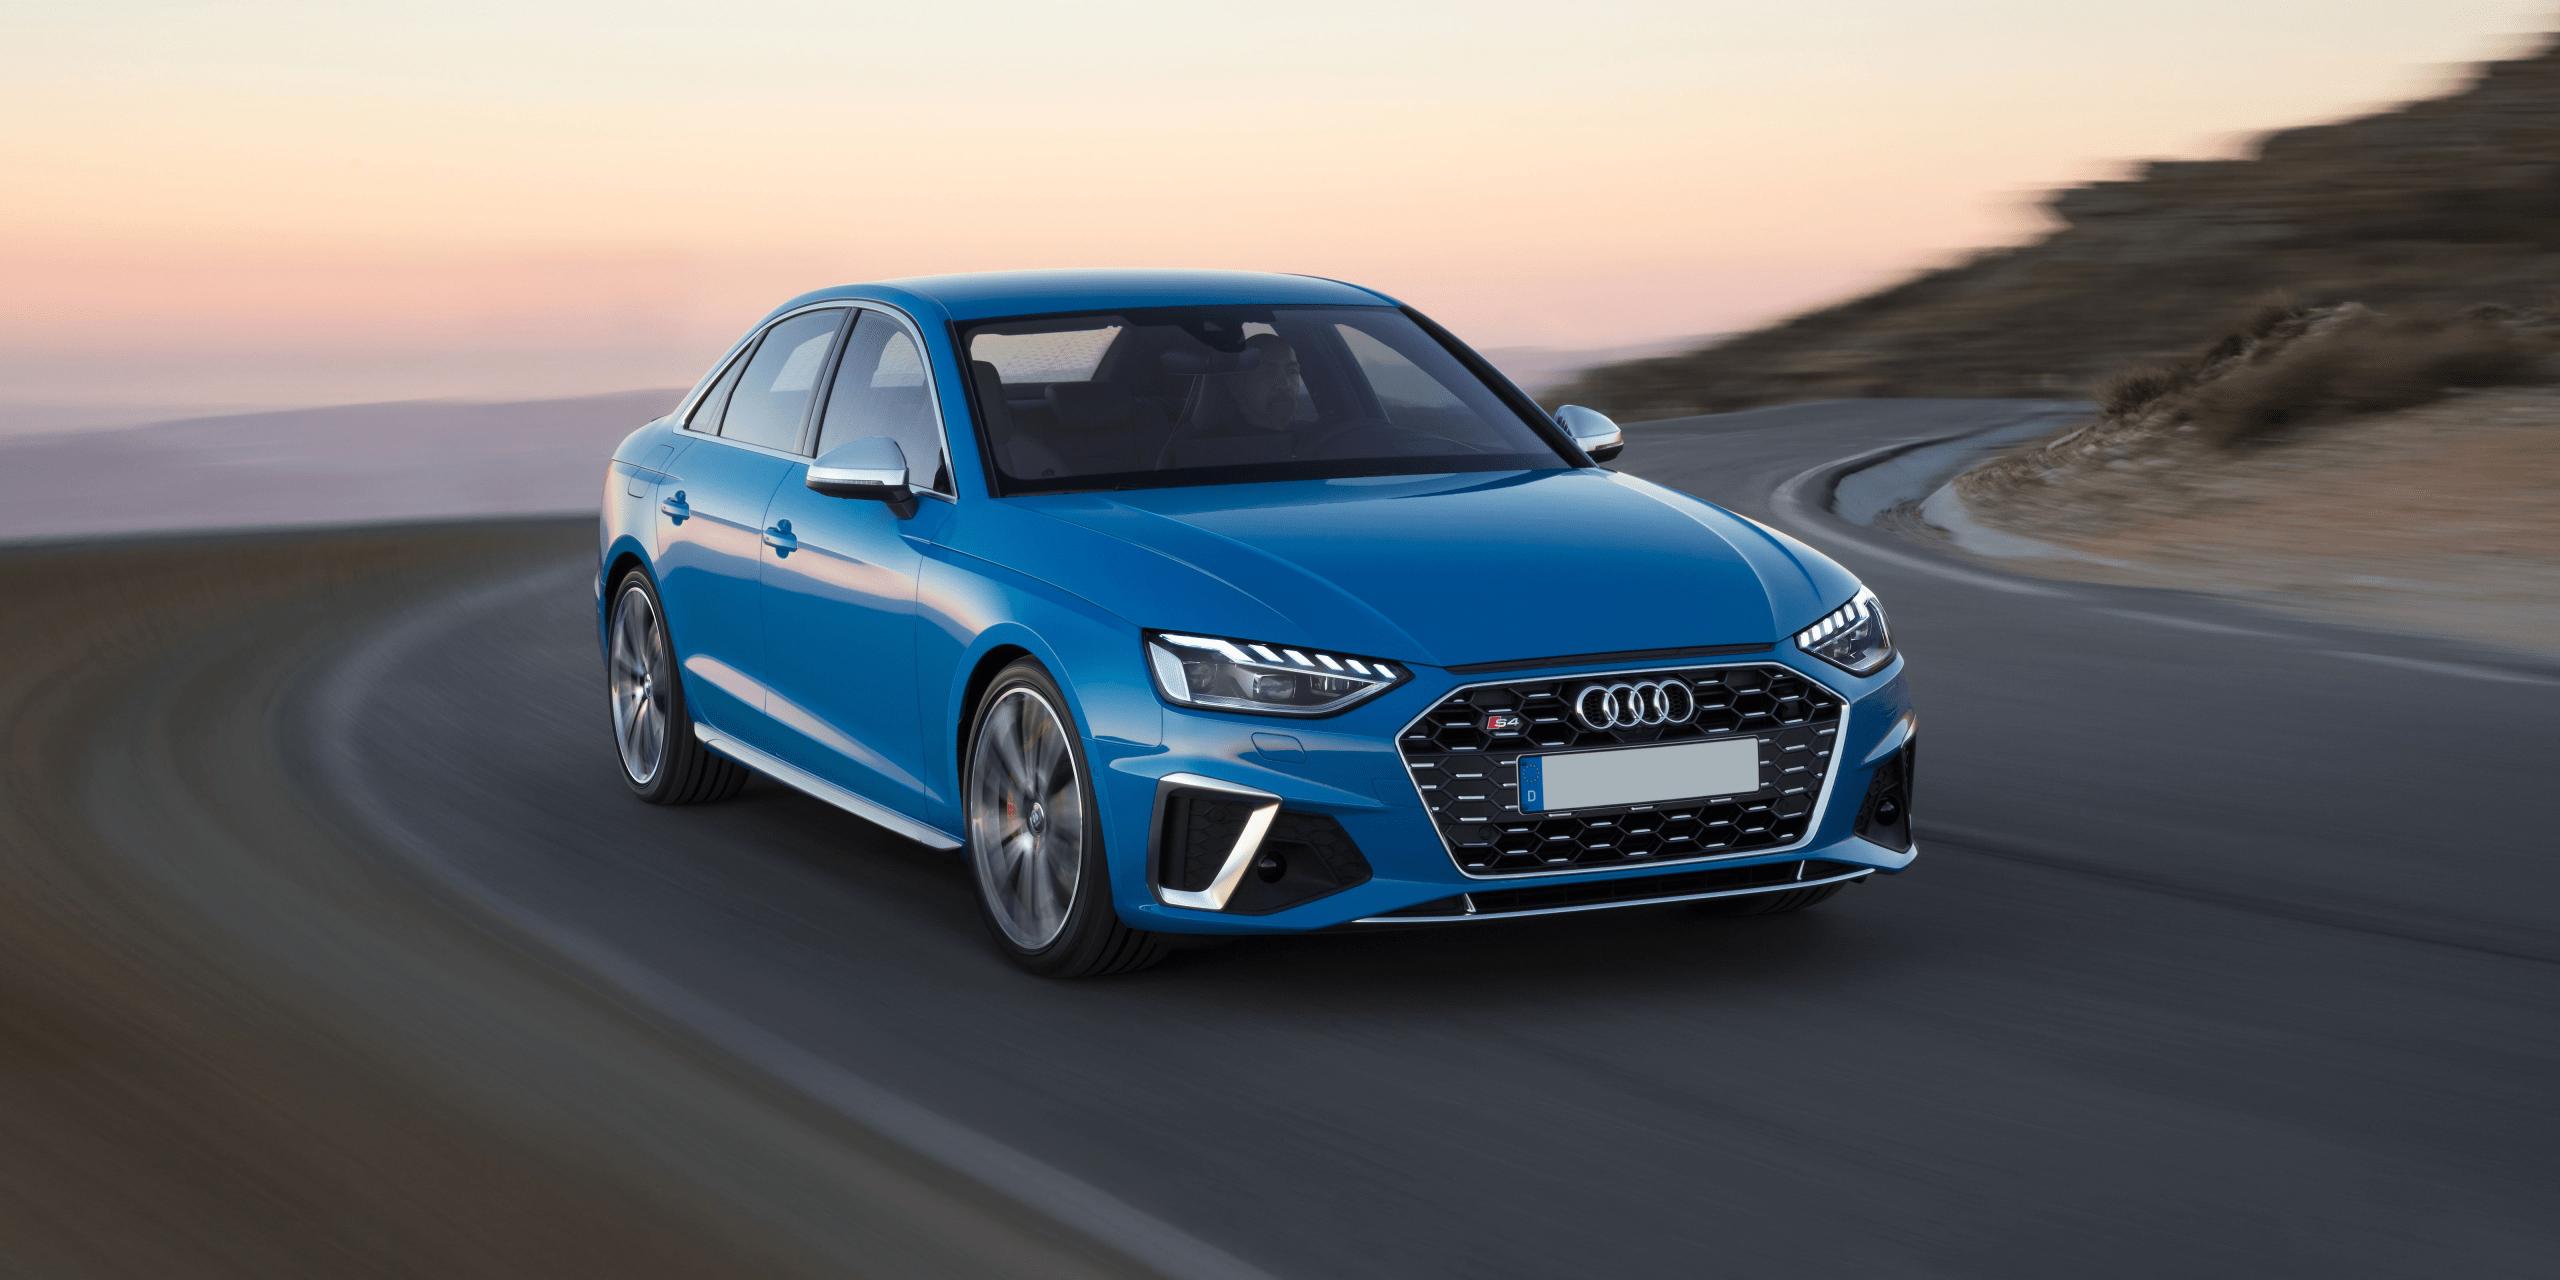 2020 Audi Sport Quattro New Review Audi A4 Audi S4 Audi